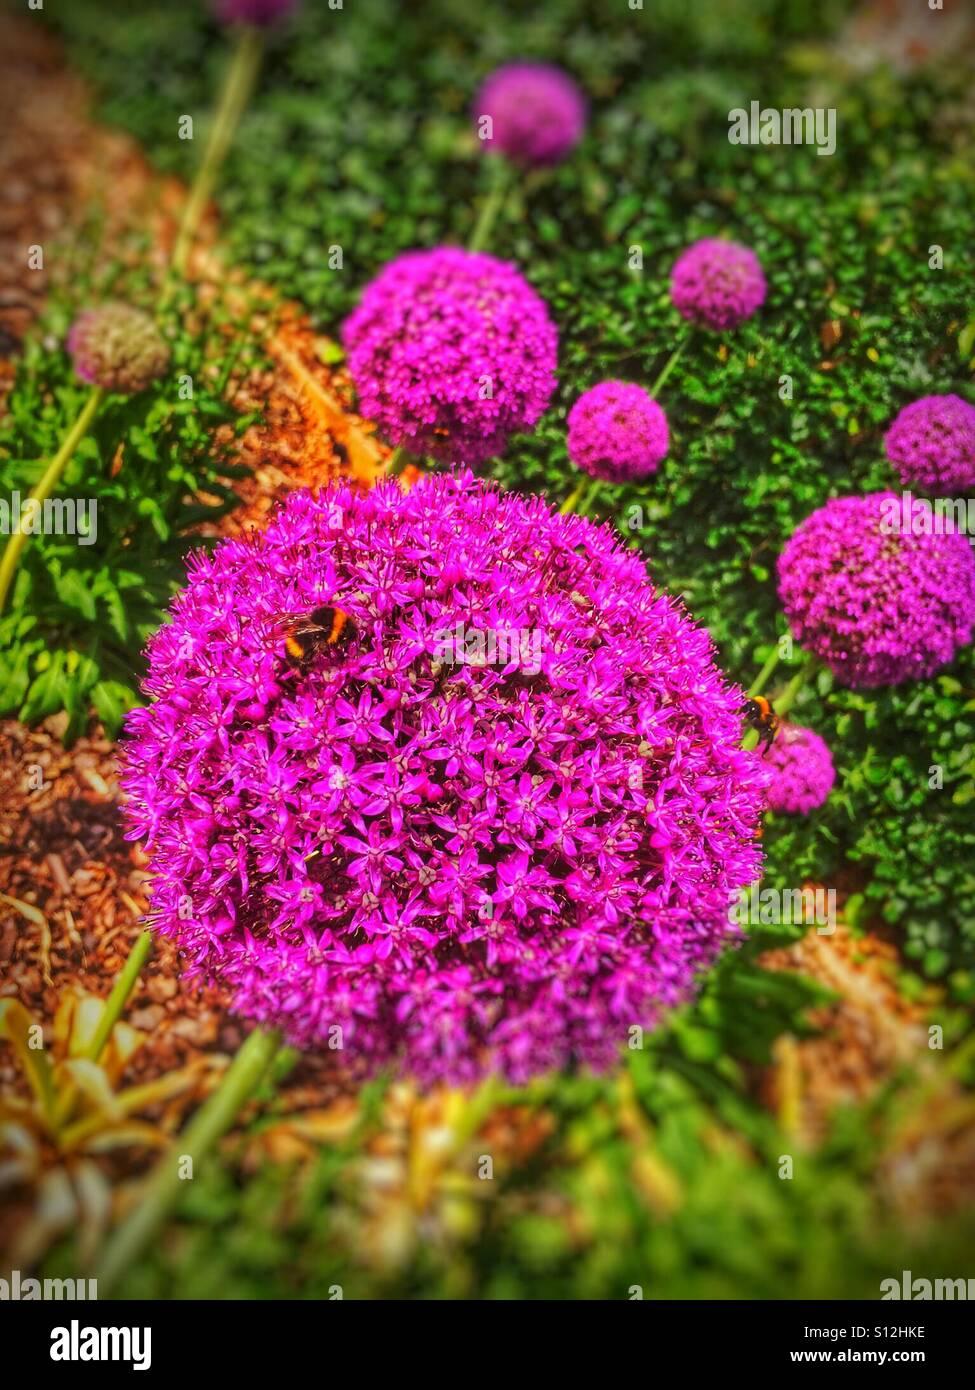 Pink allium flowers stock photo 310459058 alamy pink allium flowers mightylinksfo